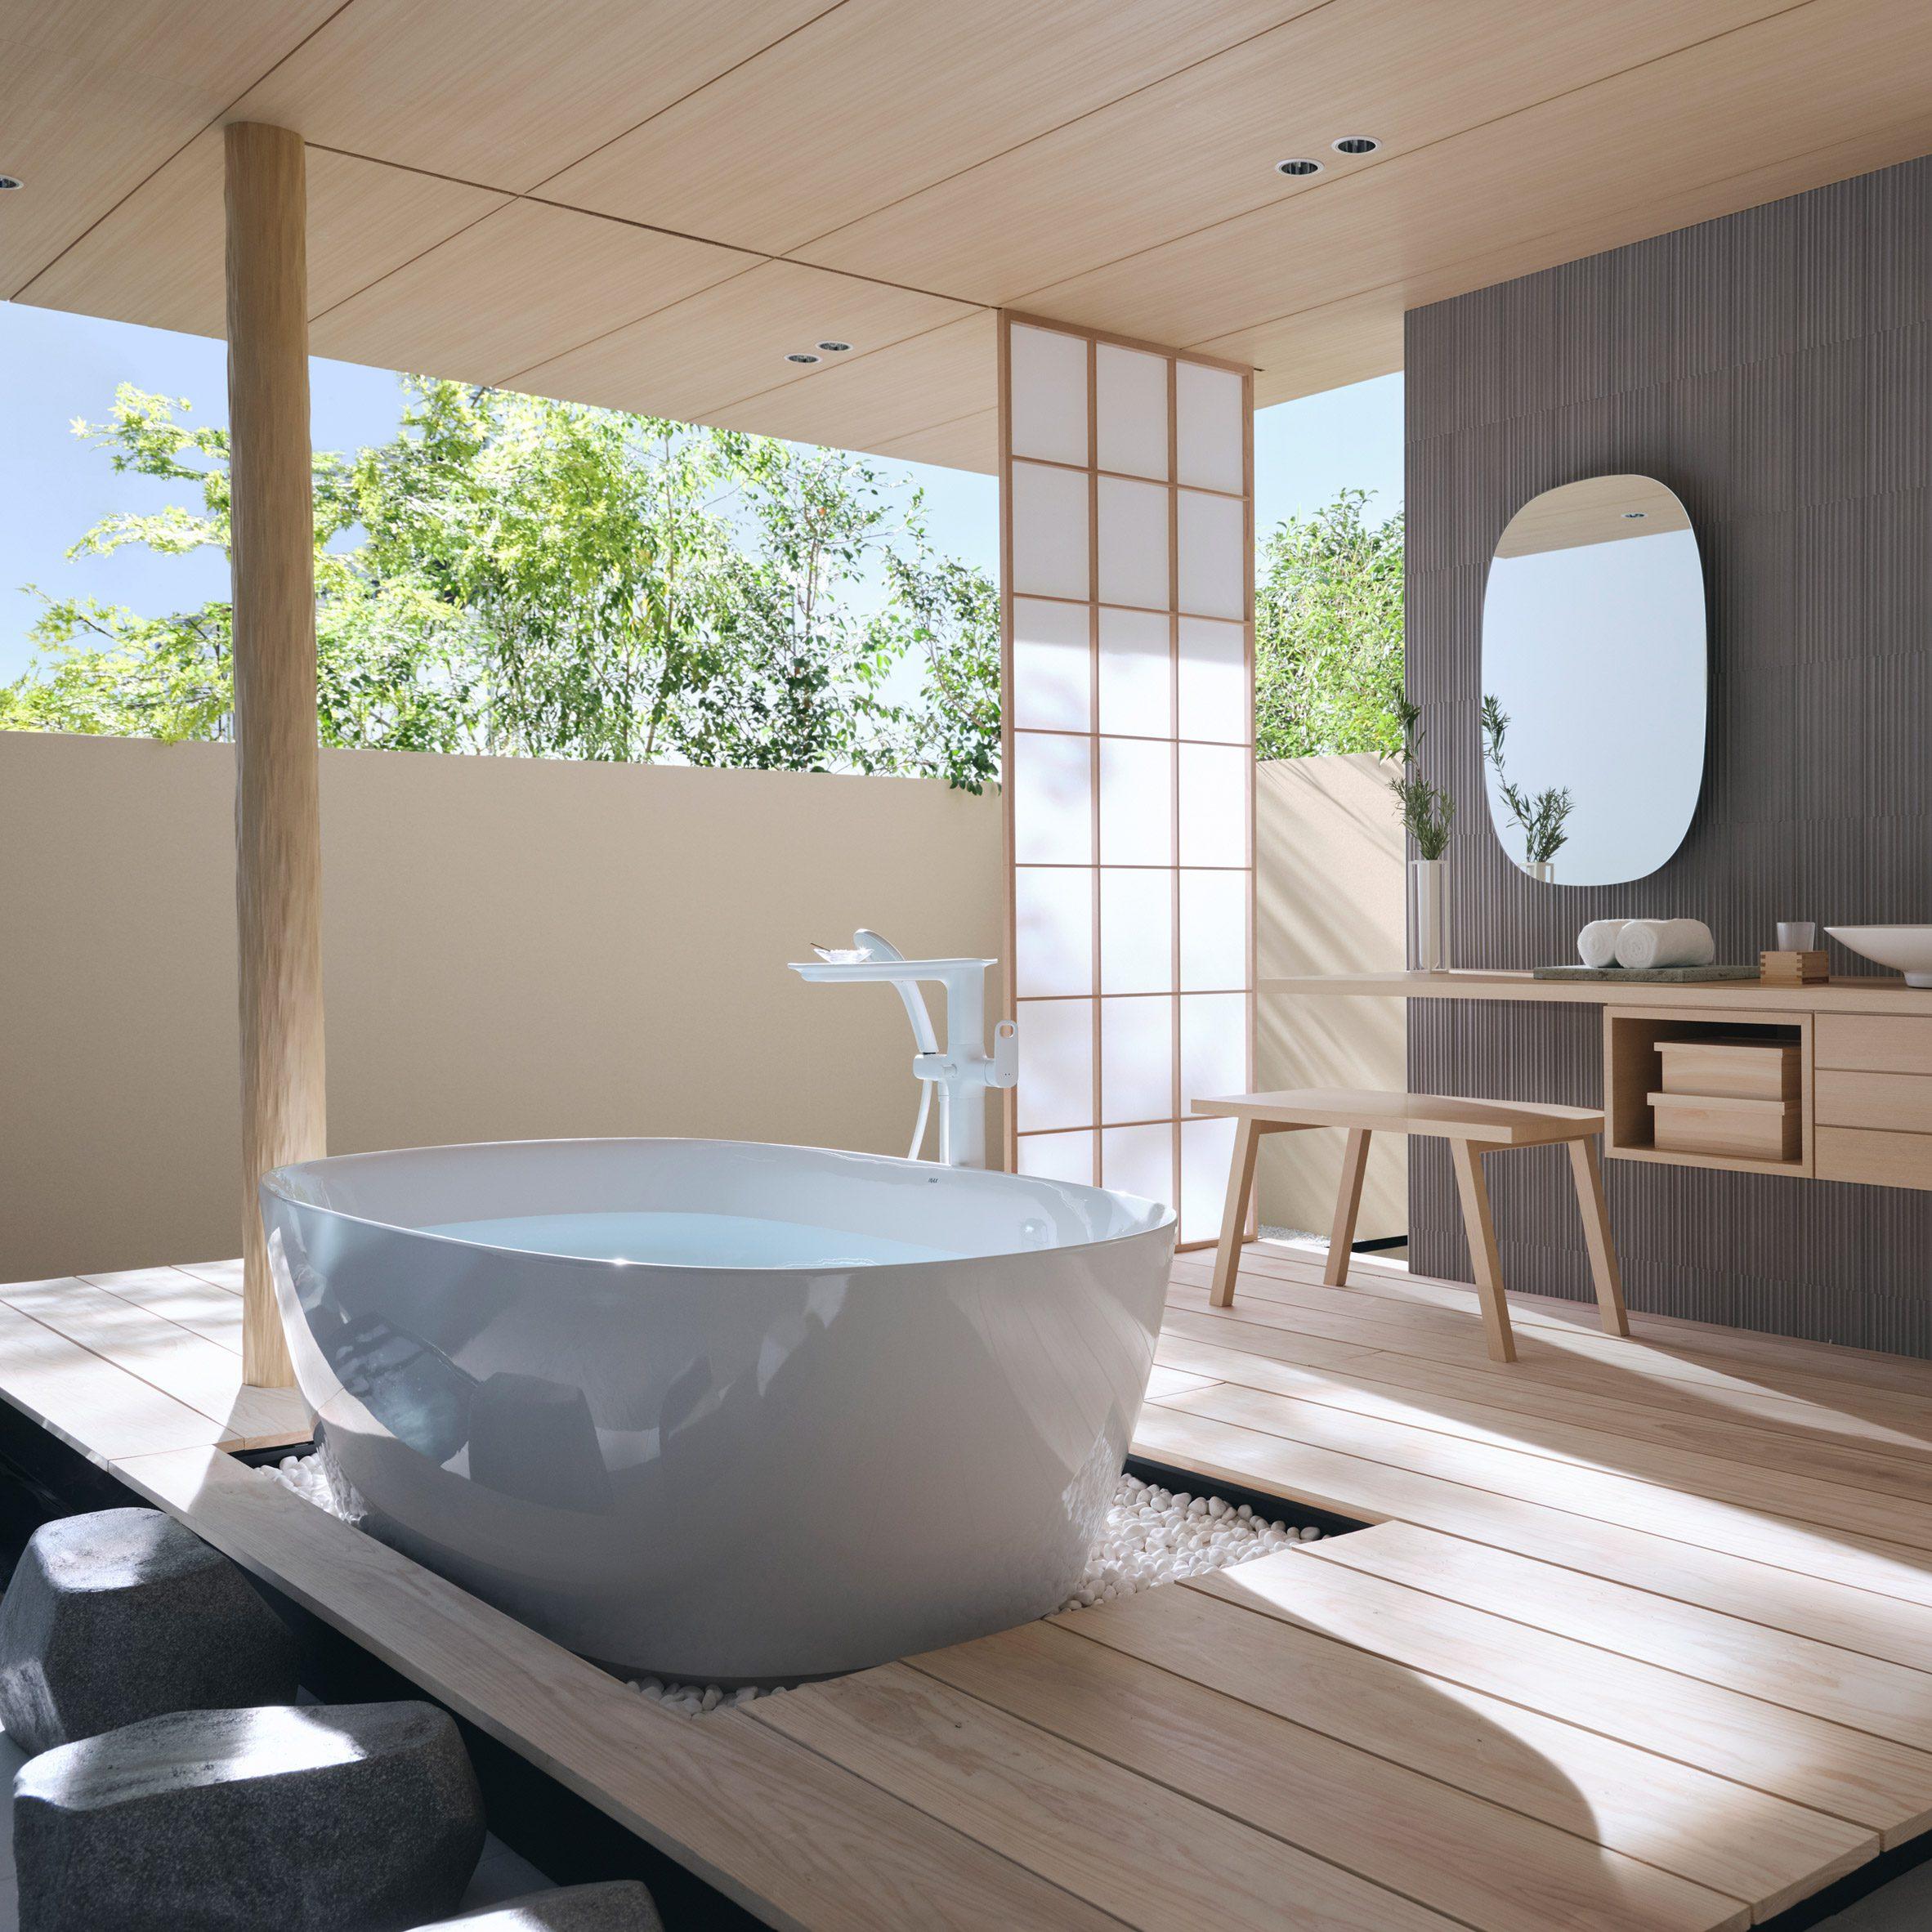 S600 Line freestanding bathtub by INAX